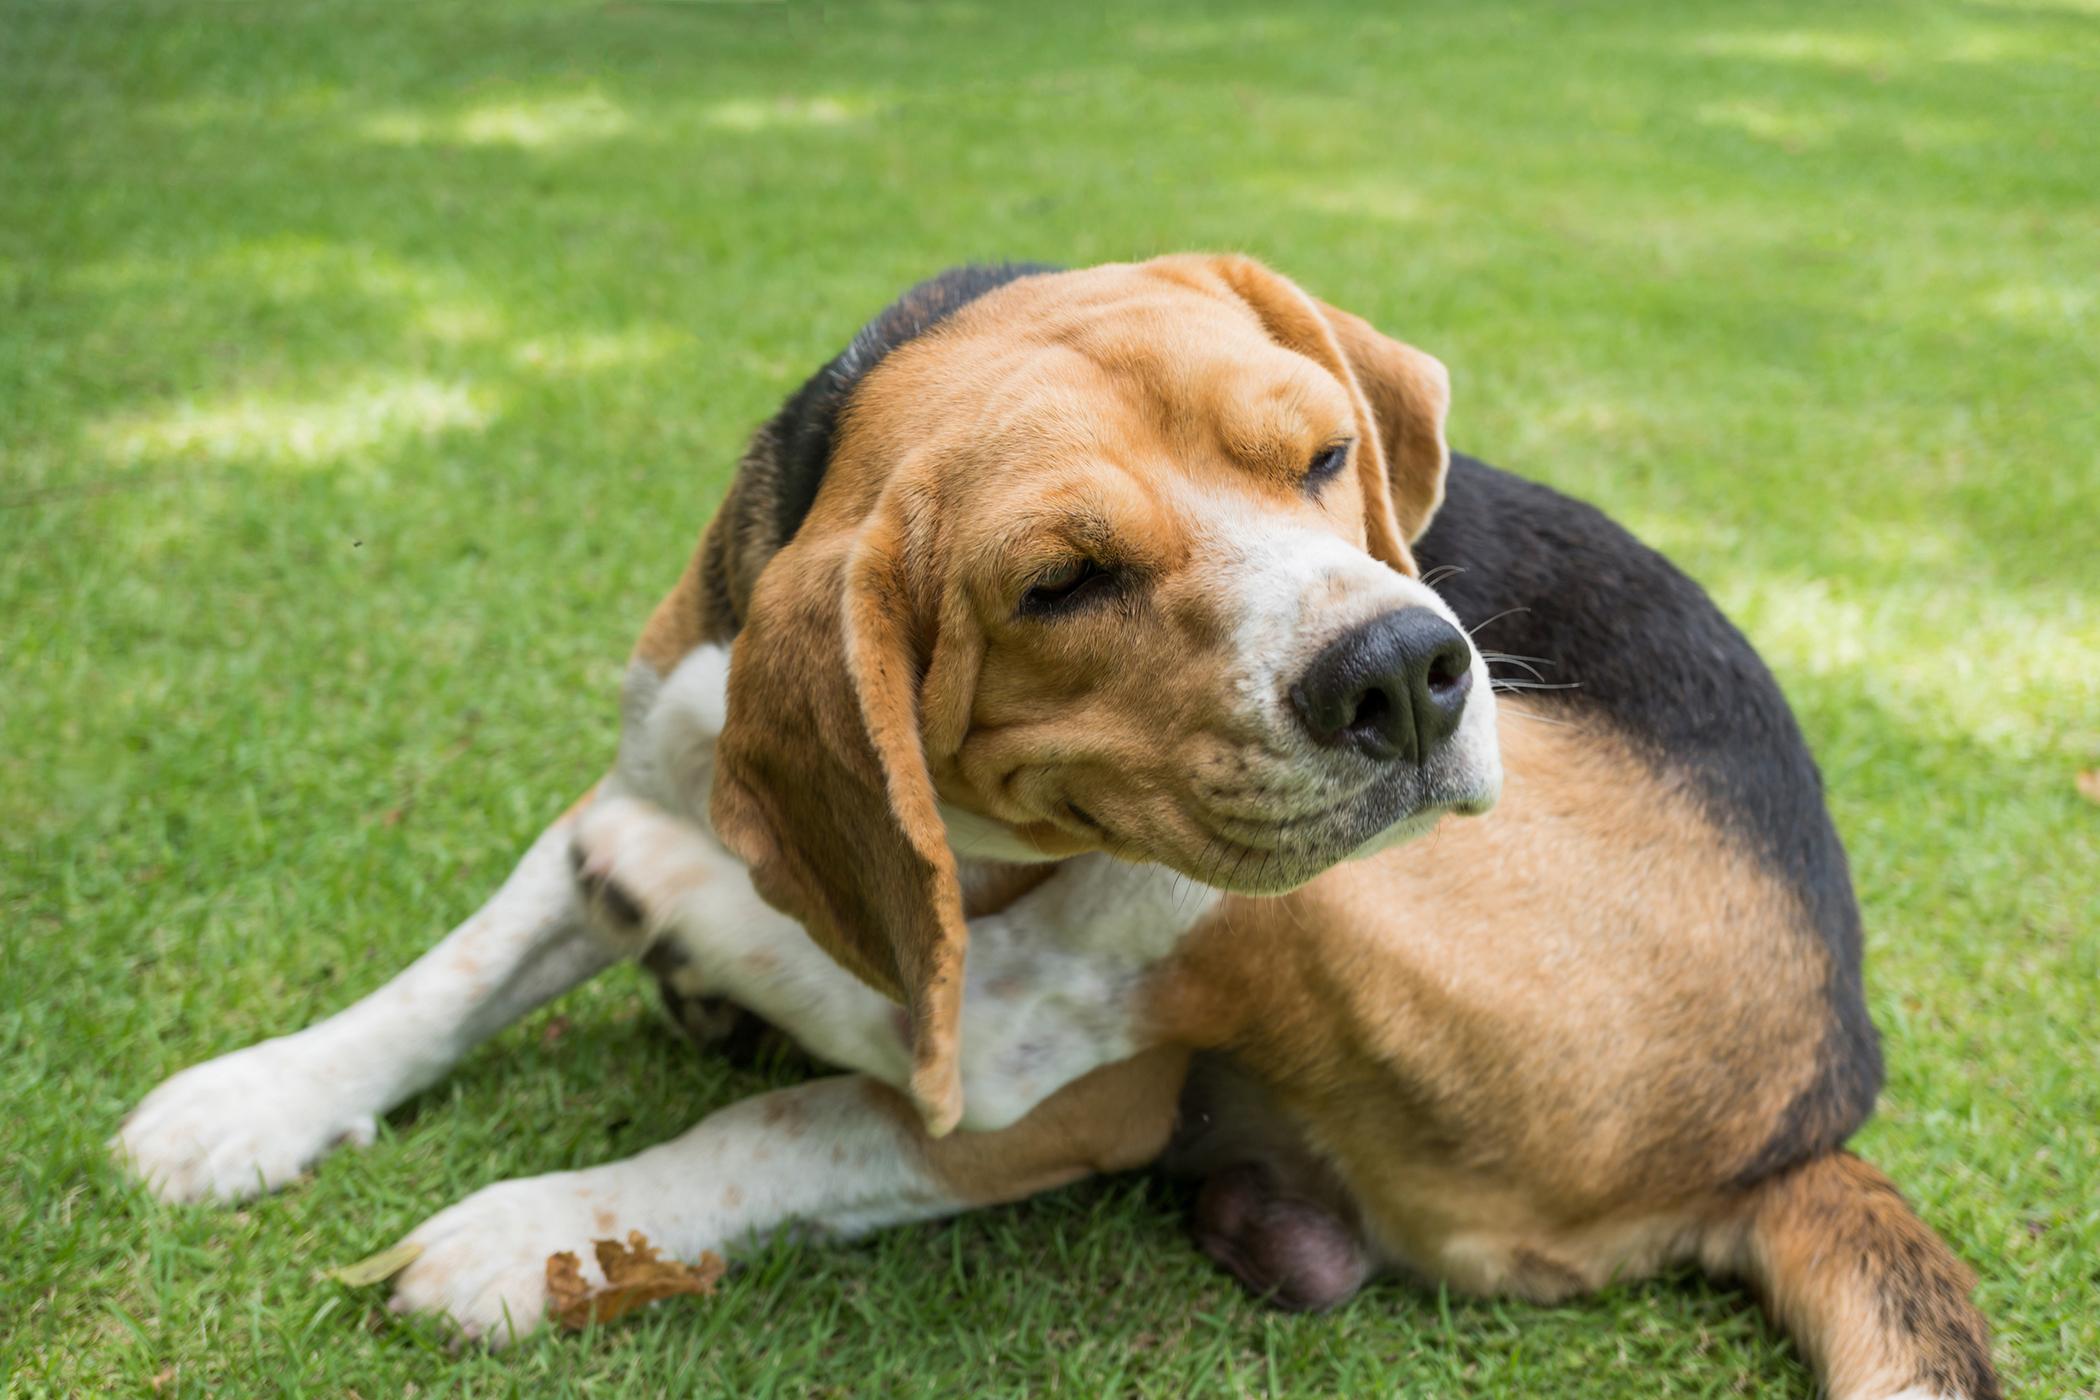 Exploratory Laparoscopy in Dogs